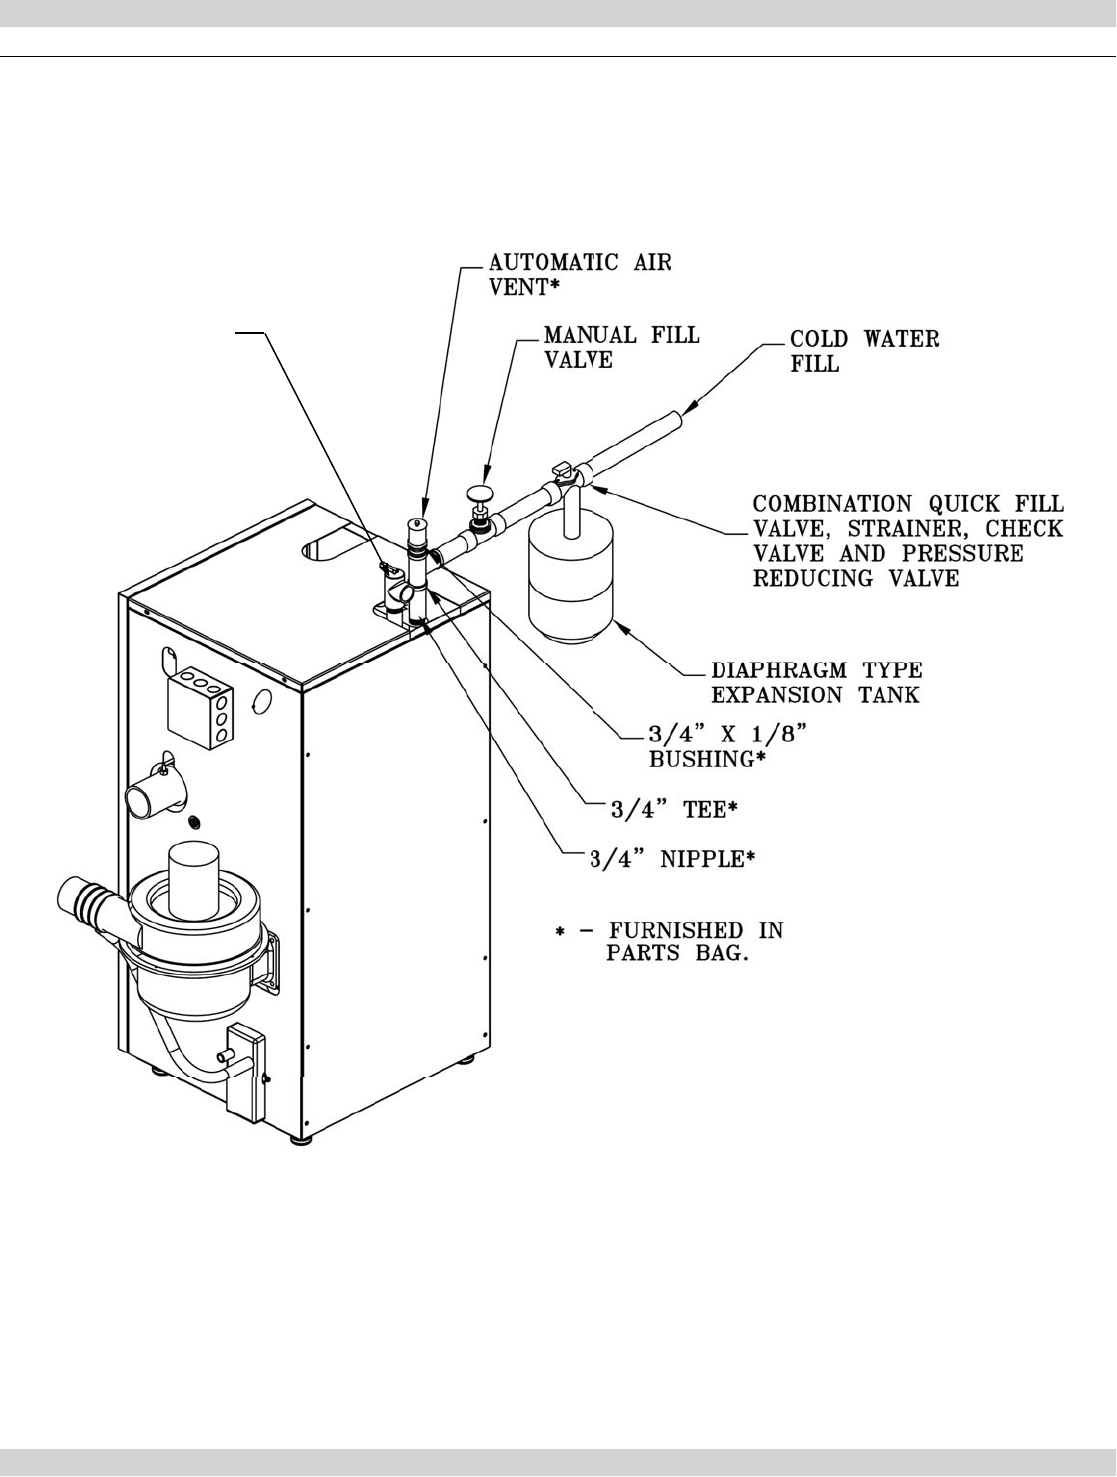 Fortable munchkin 199m photos electrical system block diagram